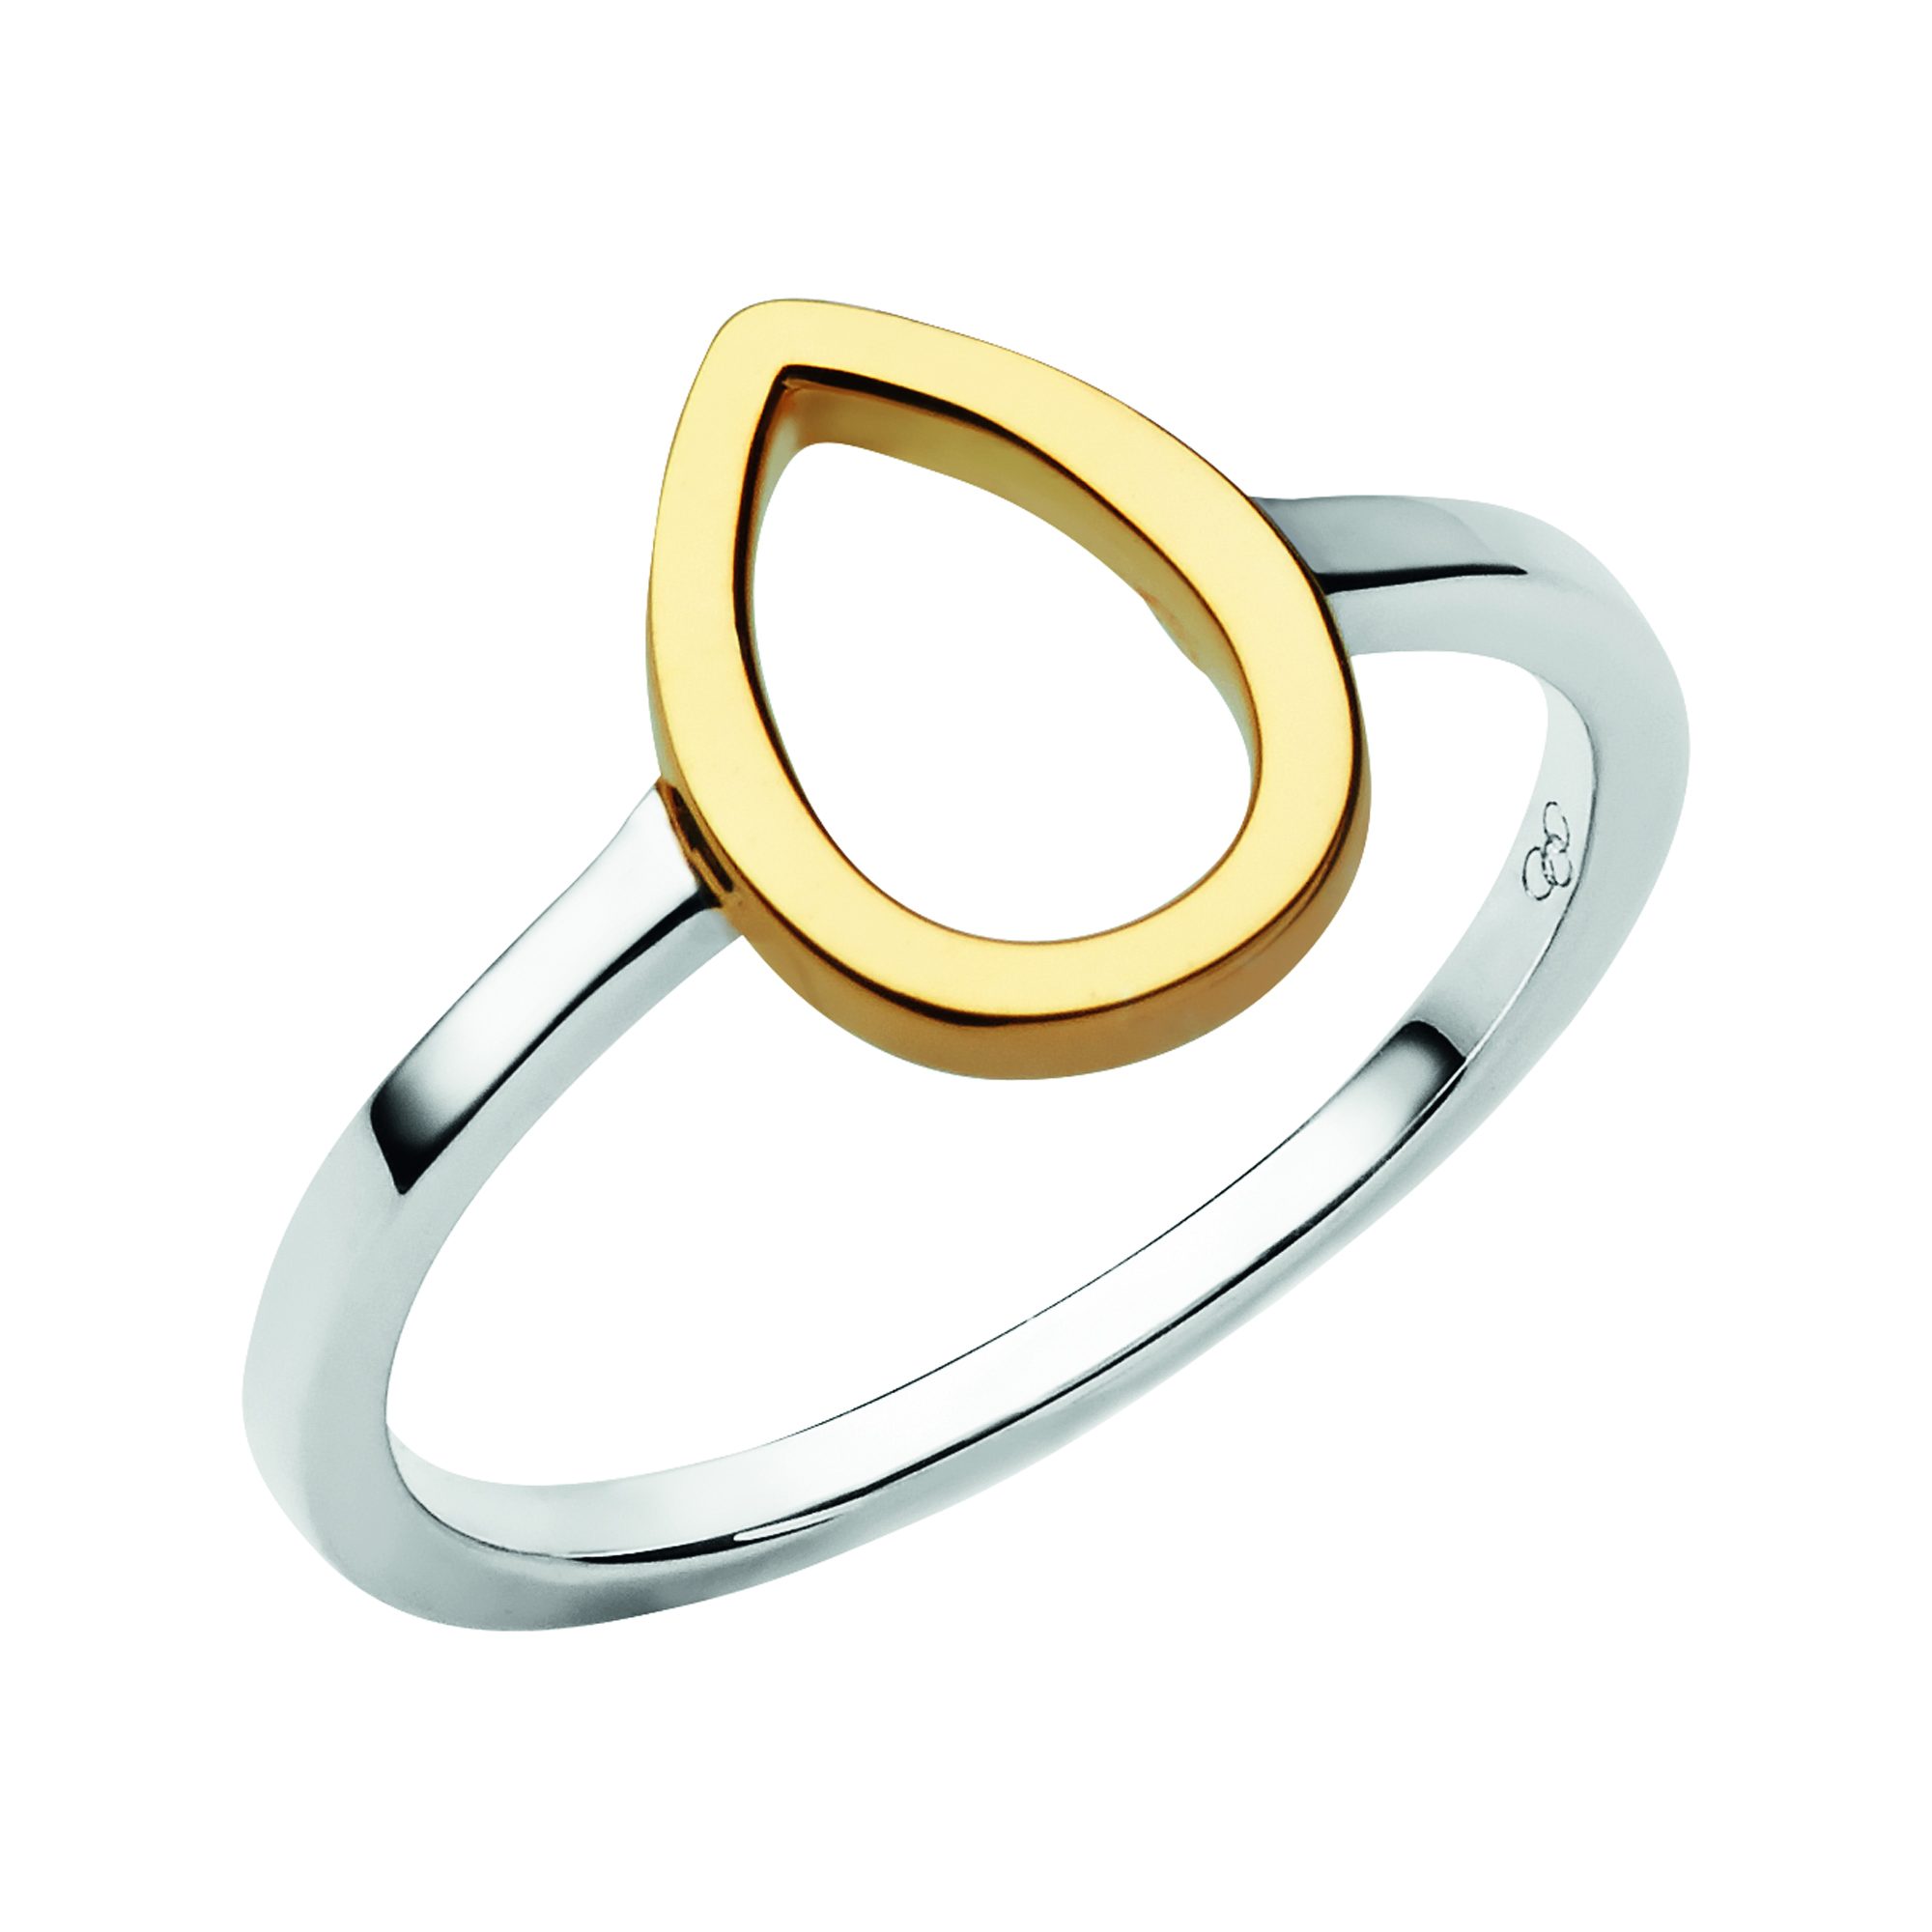 LINKS OF LONDON - Ασημένιο επιχρυσωμένο δαχτυλίδι Flare - μέγεθος 56 γυναικεία αξεσουάρ κοσμήματα δαχτυλίδια